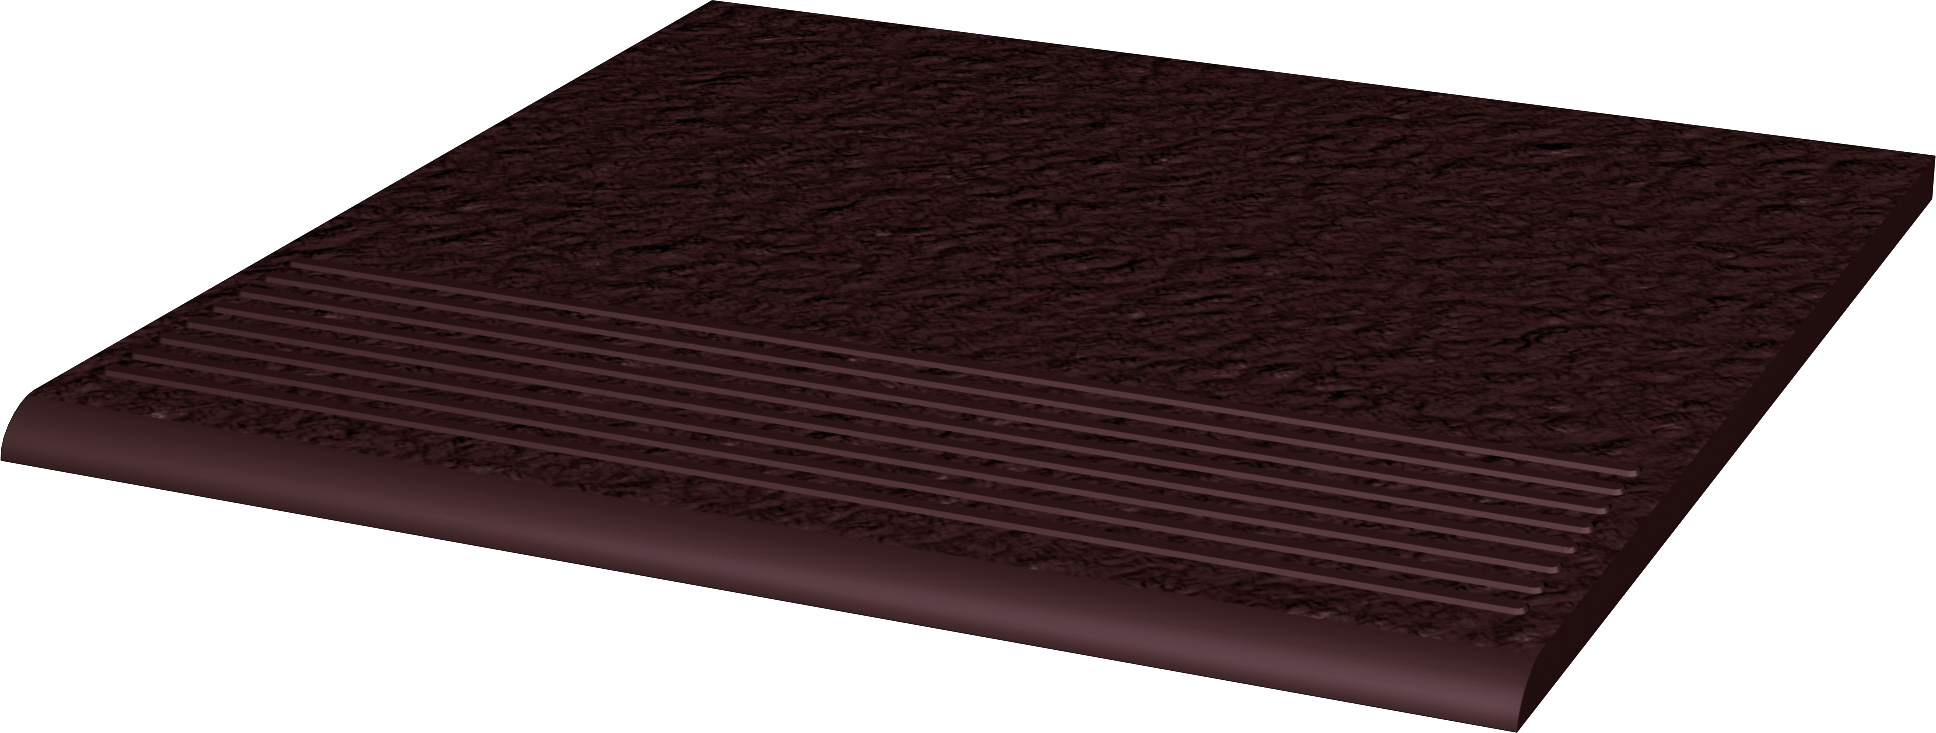 Natural Brown Duro Ступень простая структ 30х30х1,1 ступень paradyz natural простая brown duro 30x30